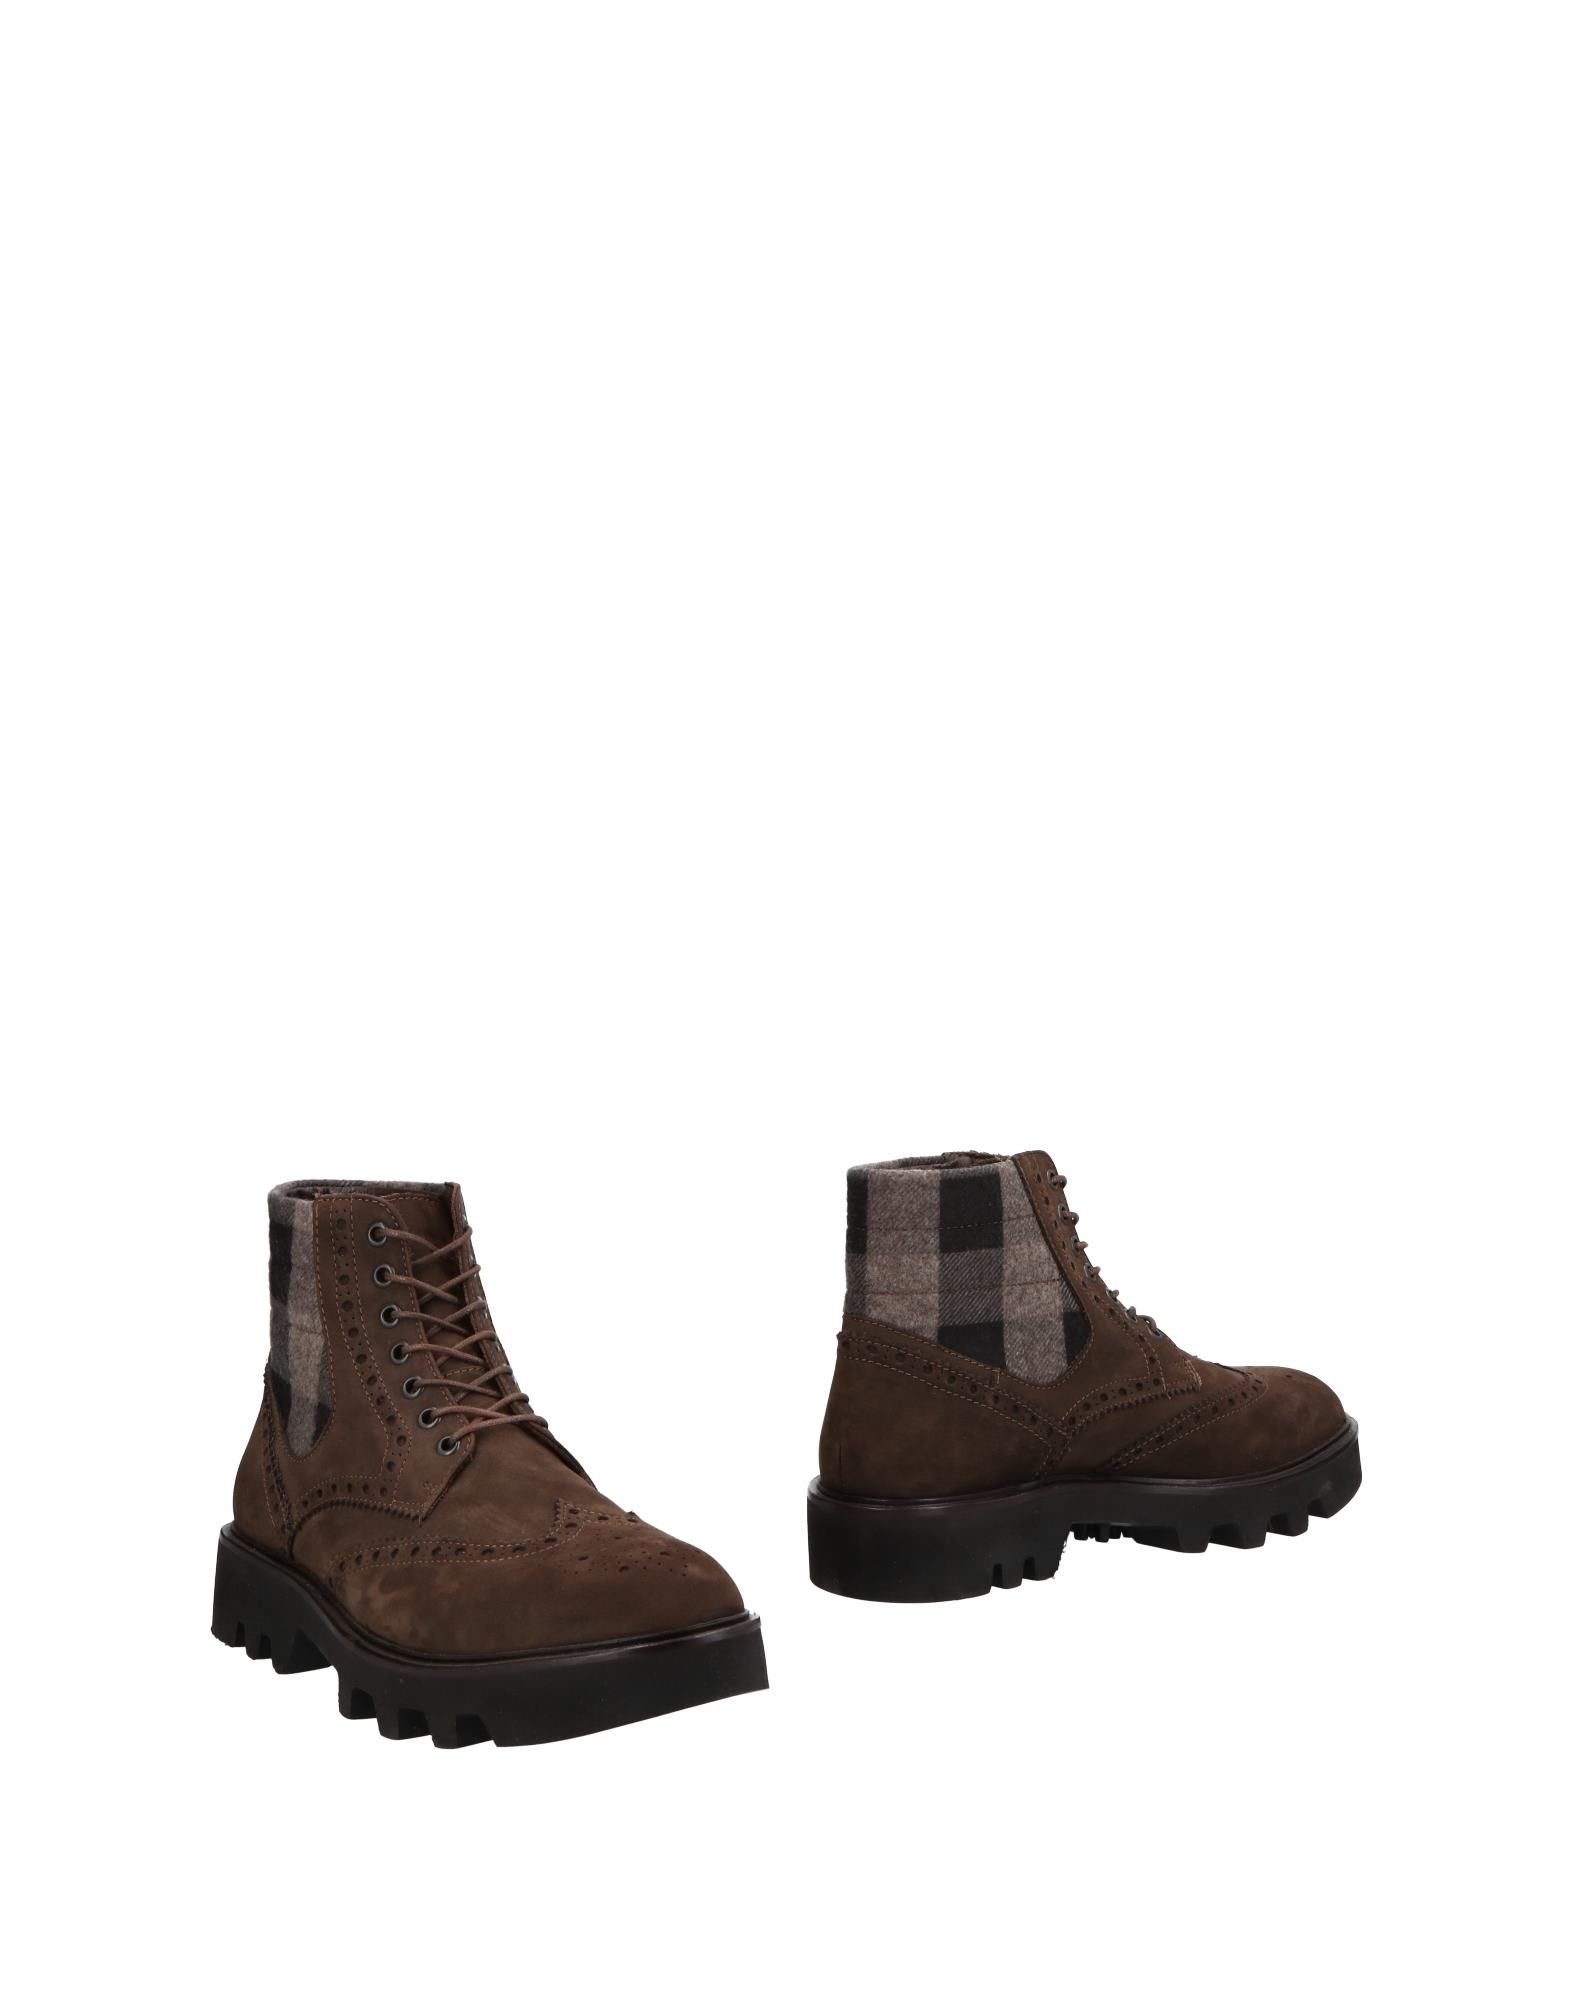 Rabatt echte Schuhe Wexford Stiefelette Herren  11494306JL